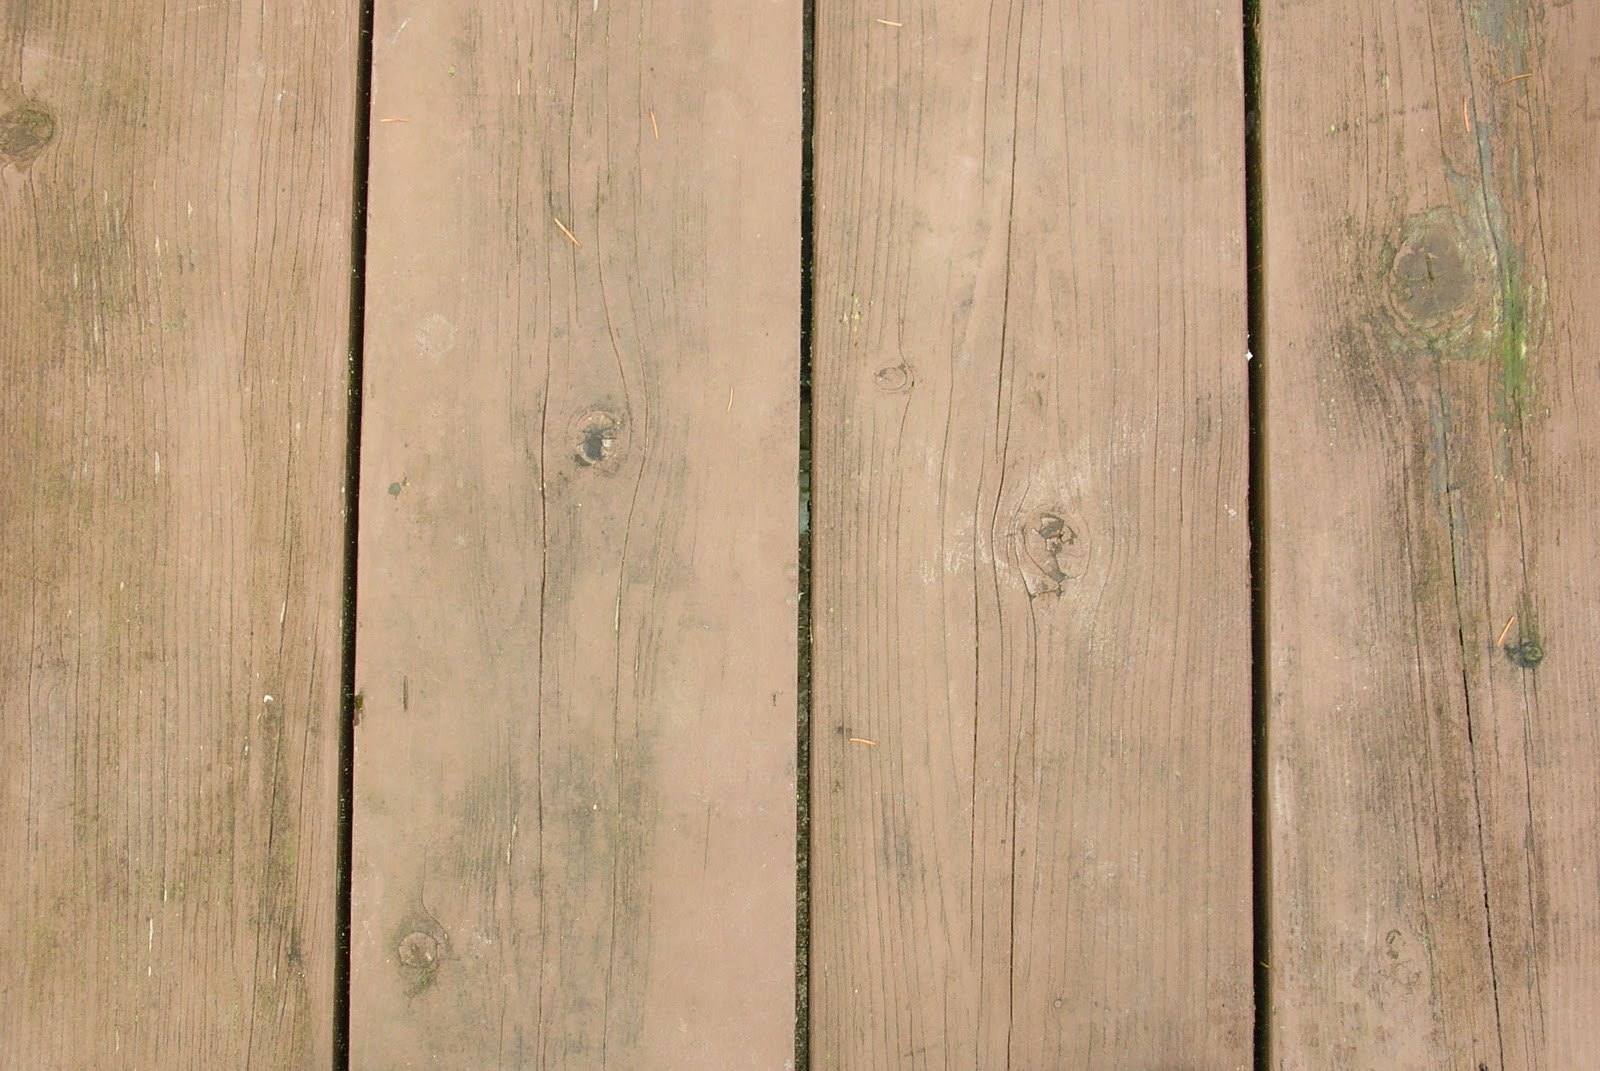 Houten achtergronden hd wallpapers - Wallpaper holz ...